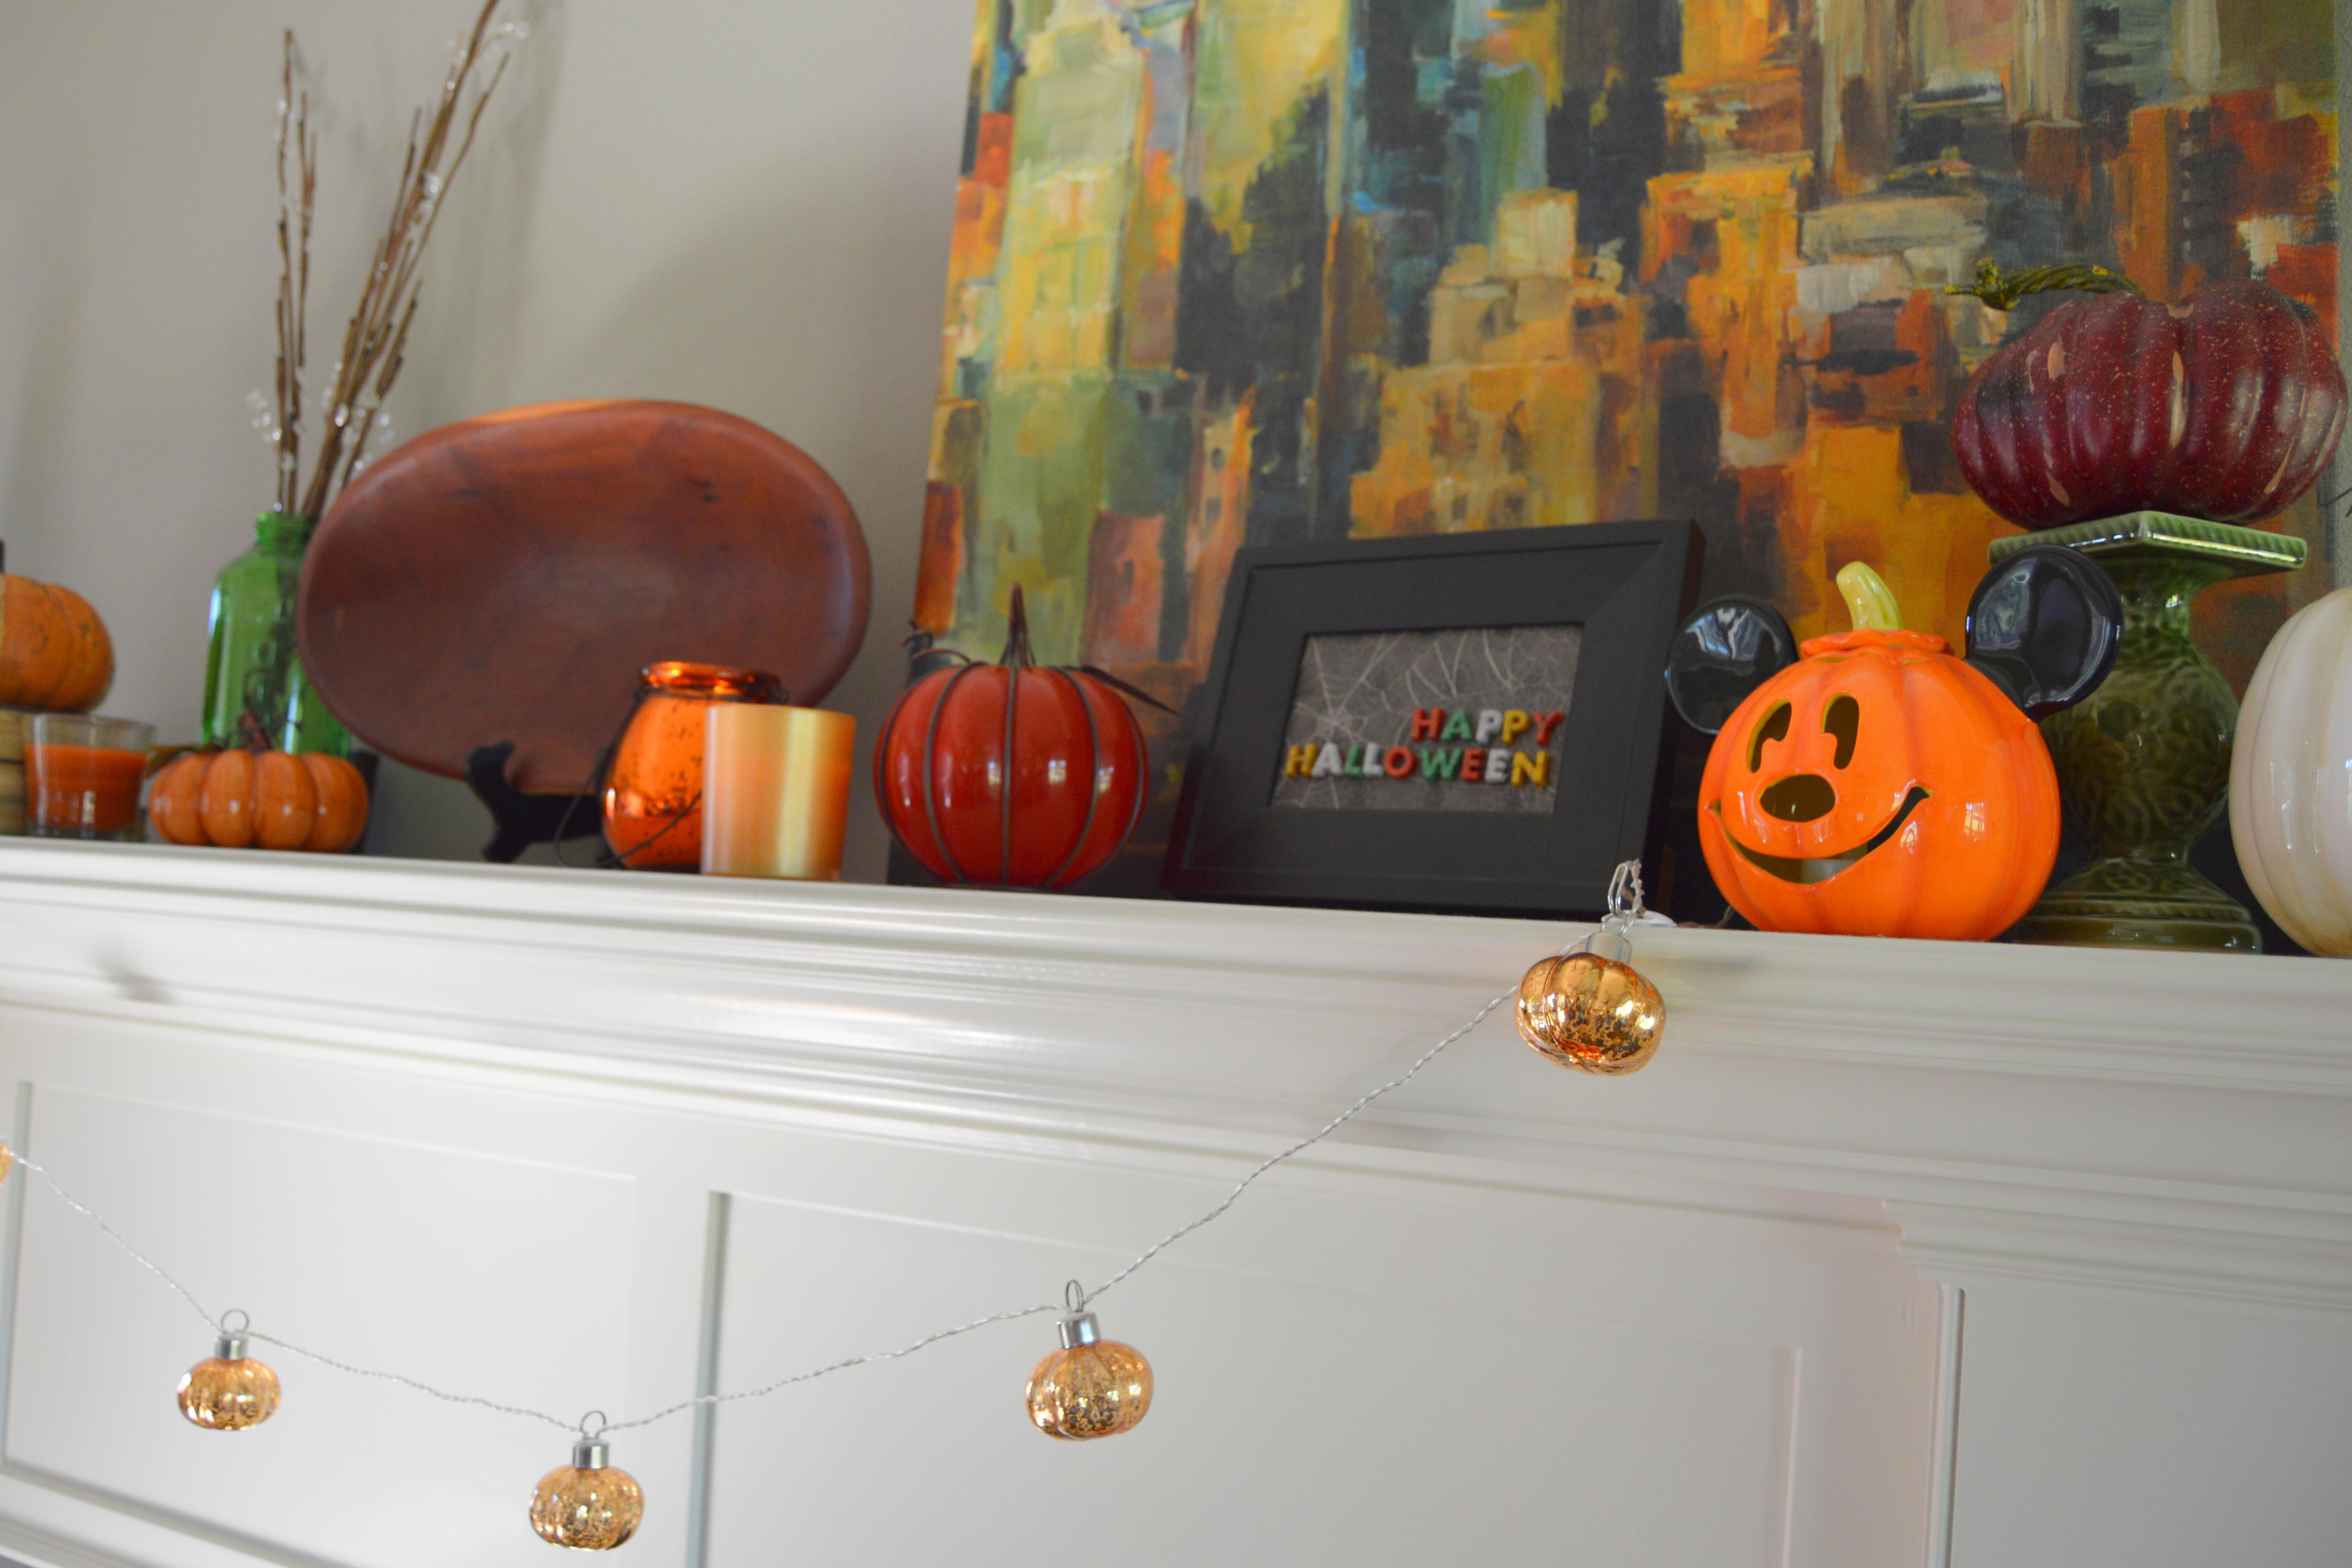 mod podge halloween crafts - my big fat happy life